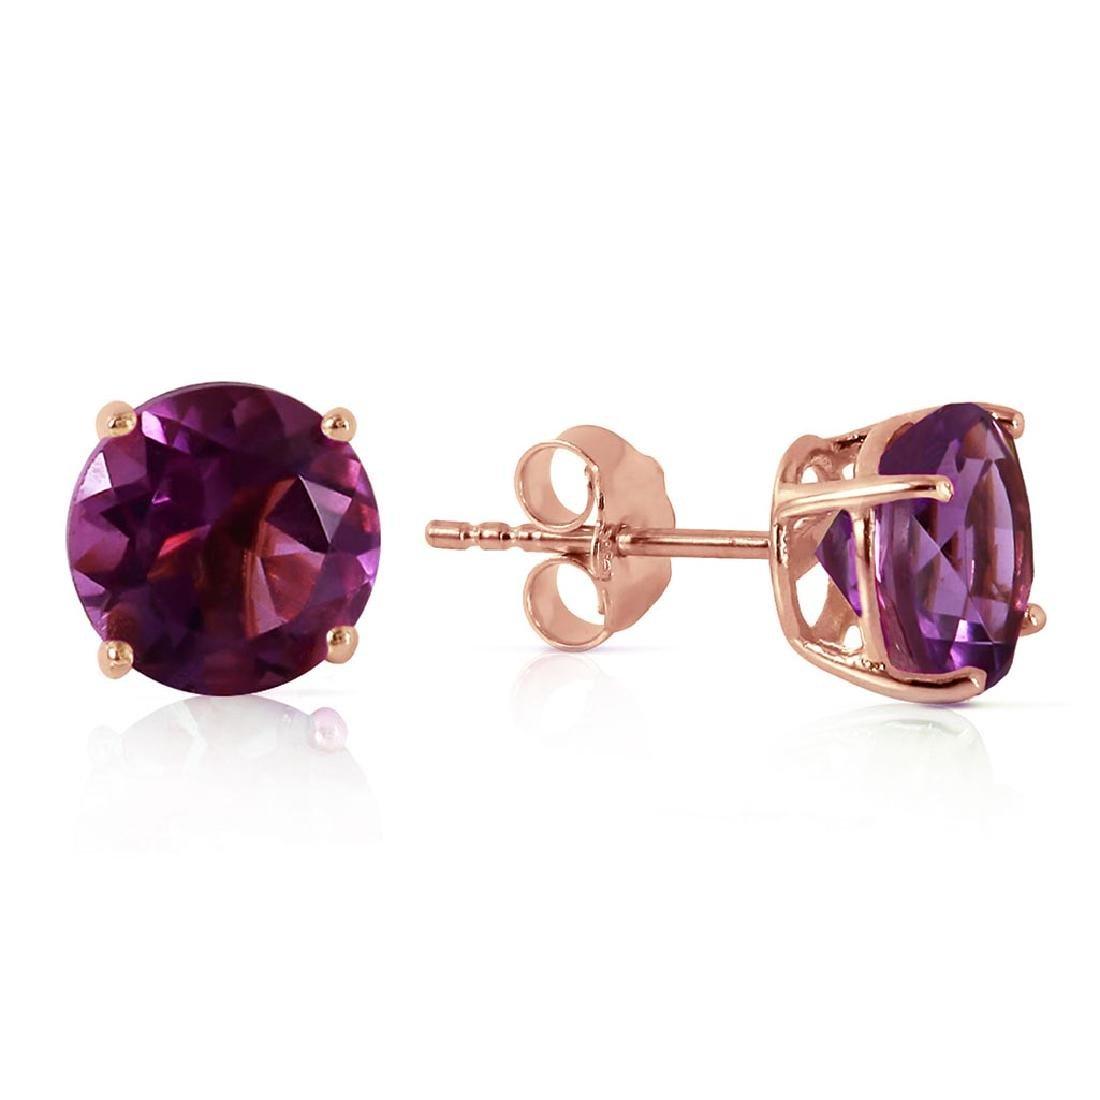 3.1 Carat 14K Solid Rose Gold Anna Amethyst Stud Earrin